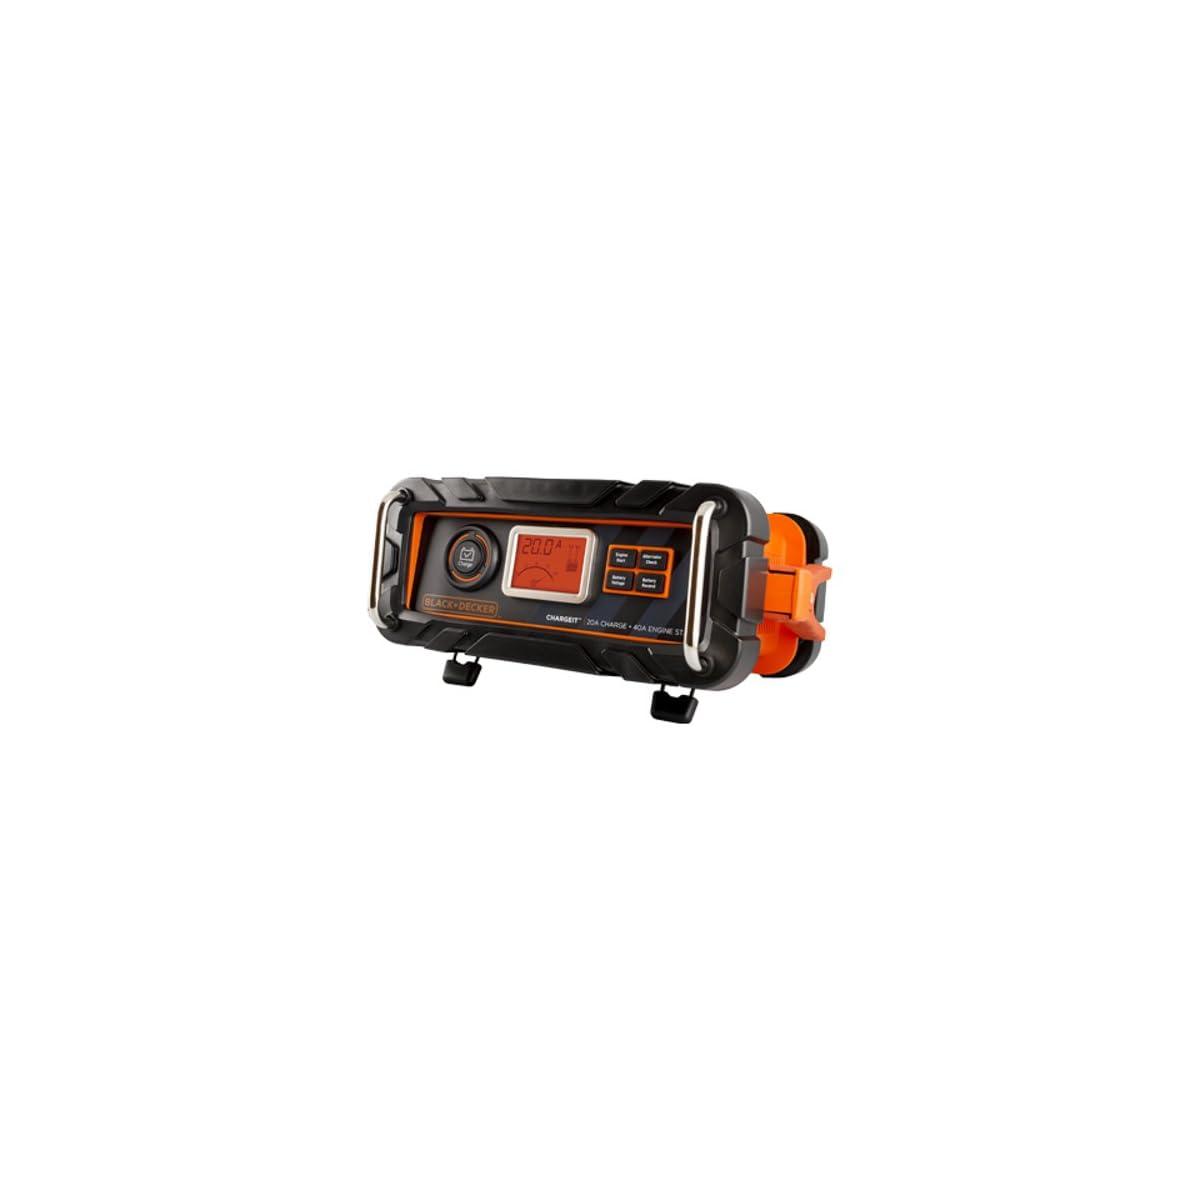 41KJiOFrgUL. SS1200  - CARGADOR 20 AMP+ ARRANCADOR